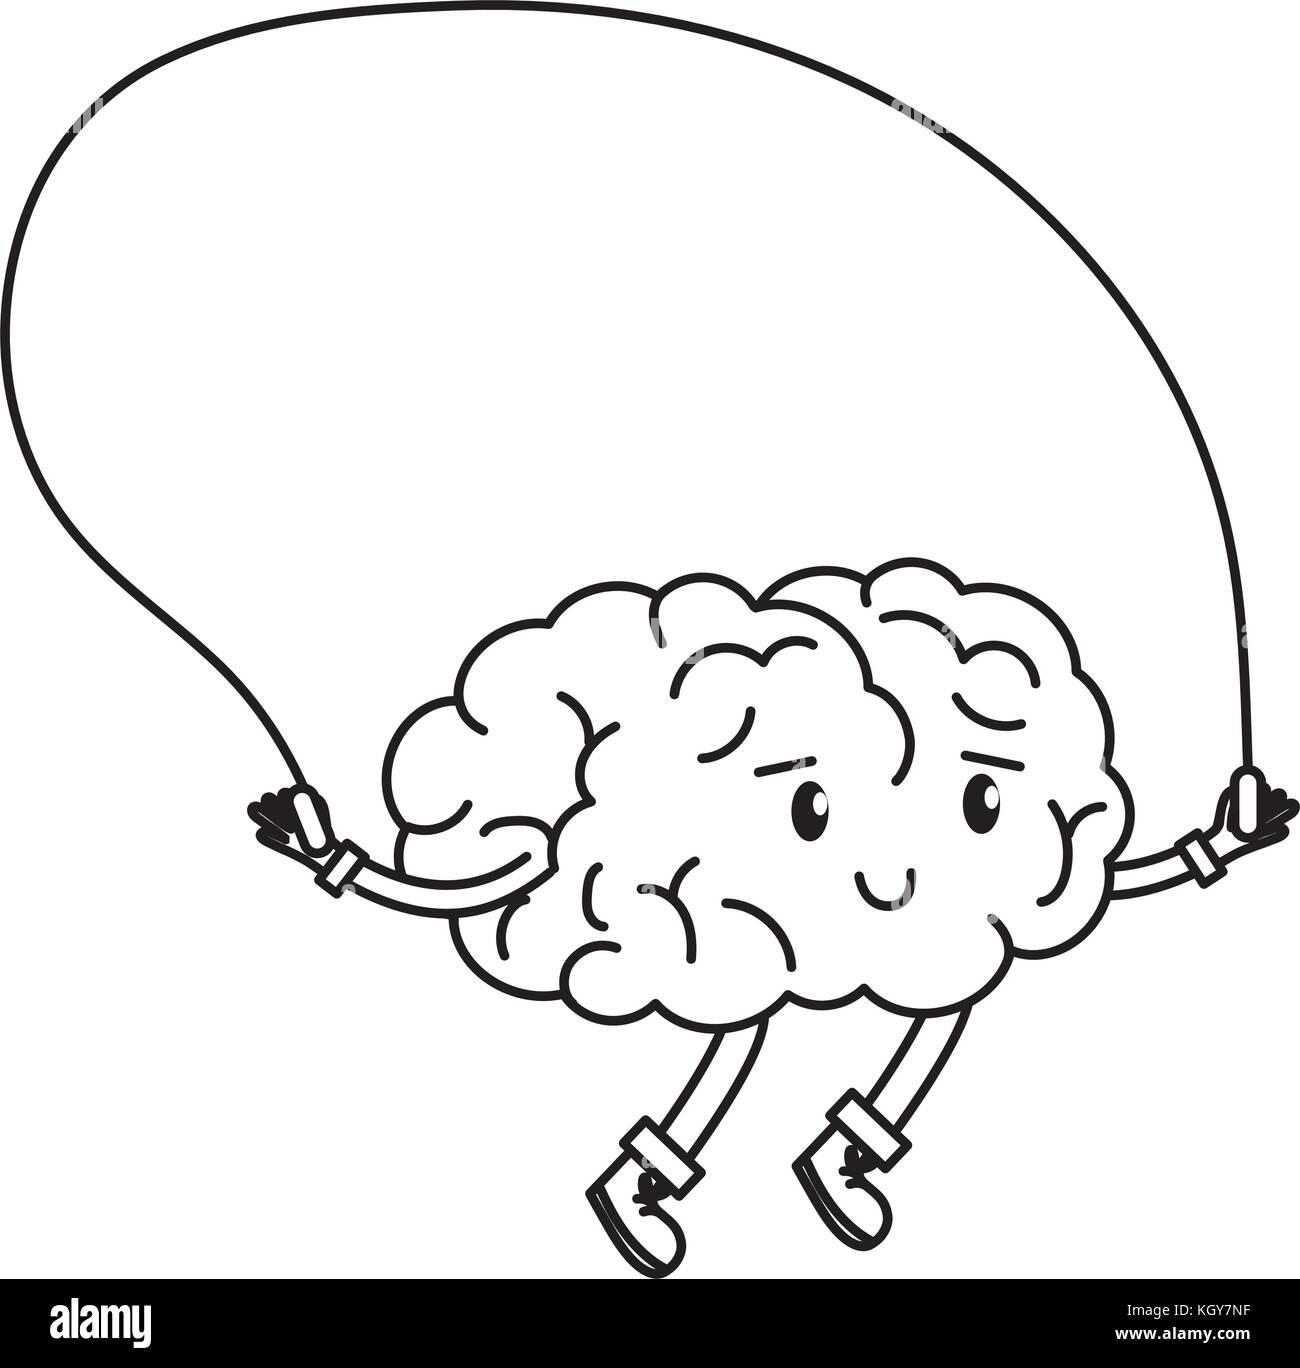 Brain cartoon design - Stock Image